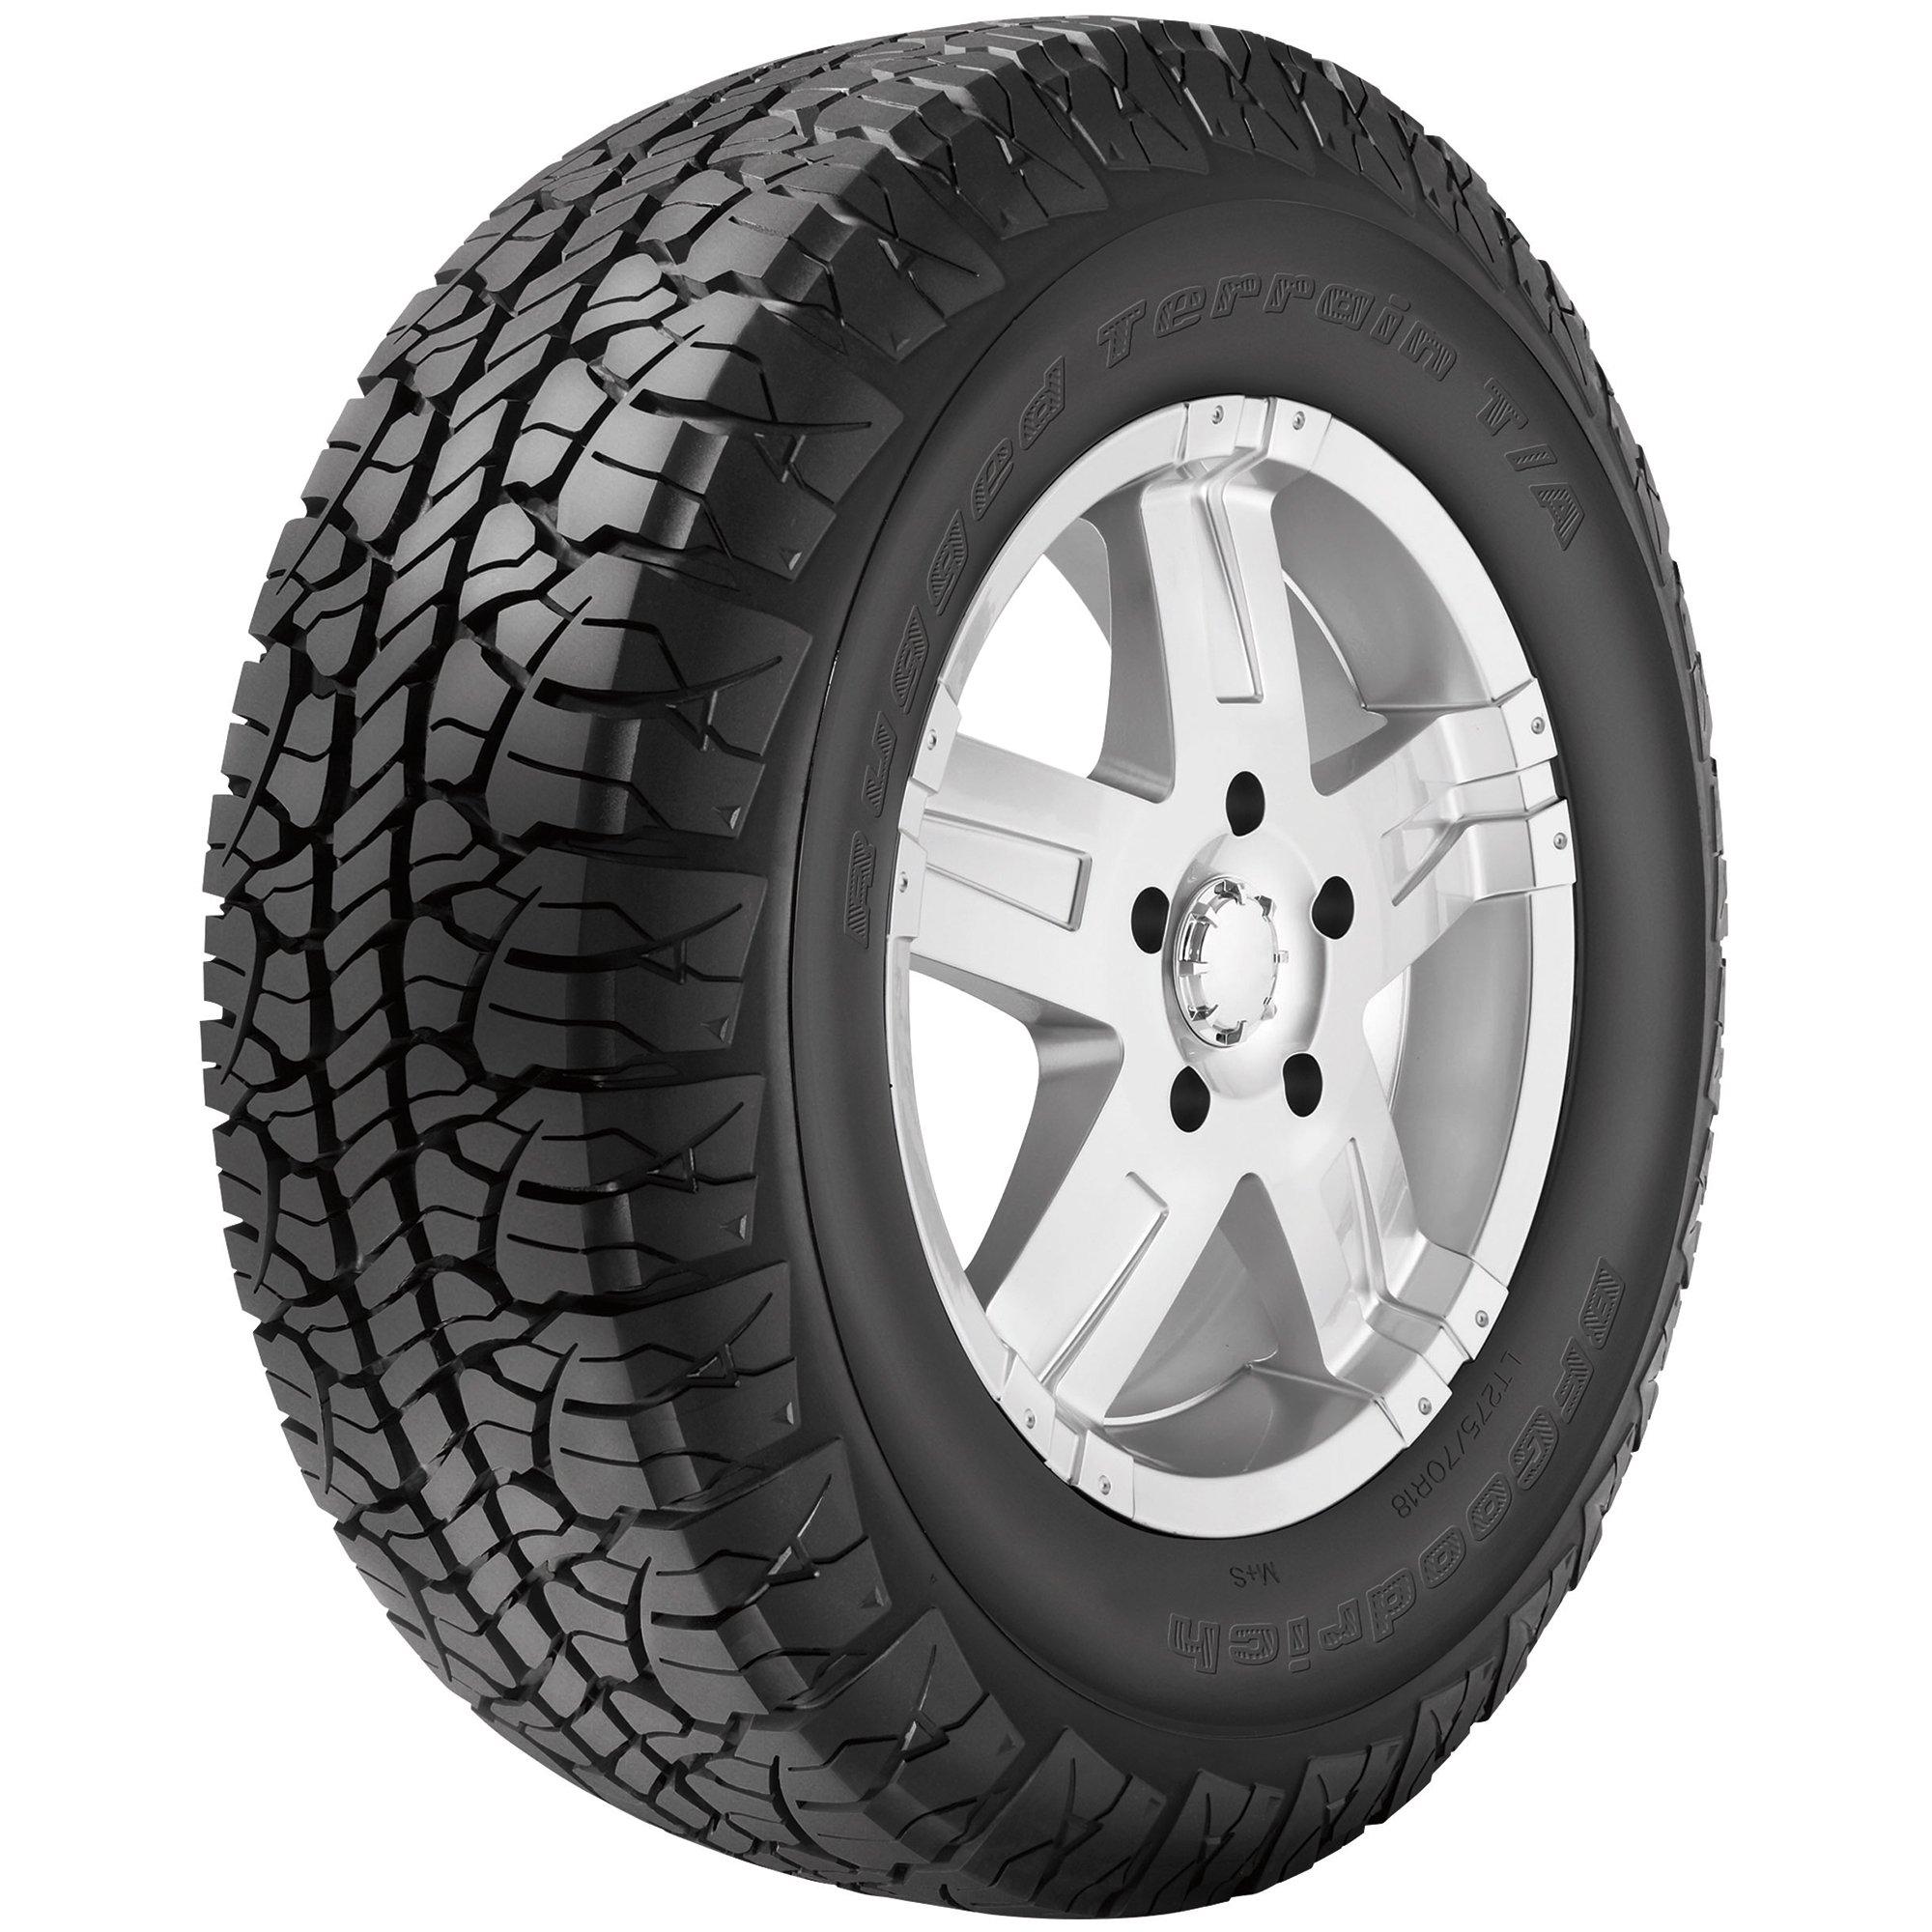 Bf Goodrich Truck Tires >> Bfgoodrich Rugged Terrain T A Tire P235 70r16 104t